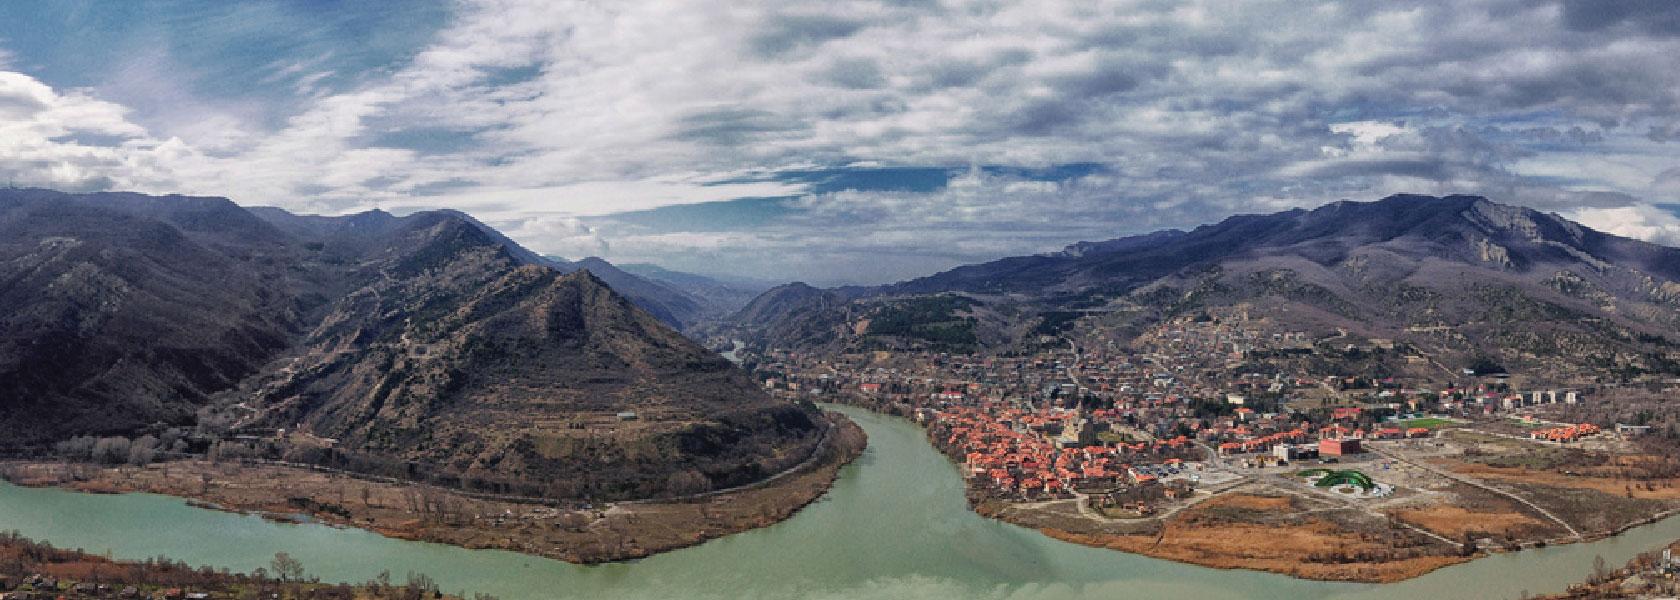 Tbilisi & Mtskheta